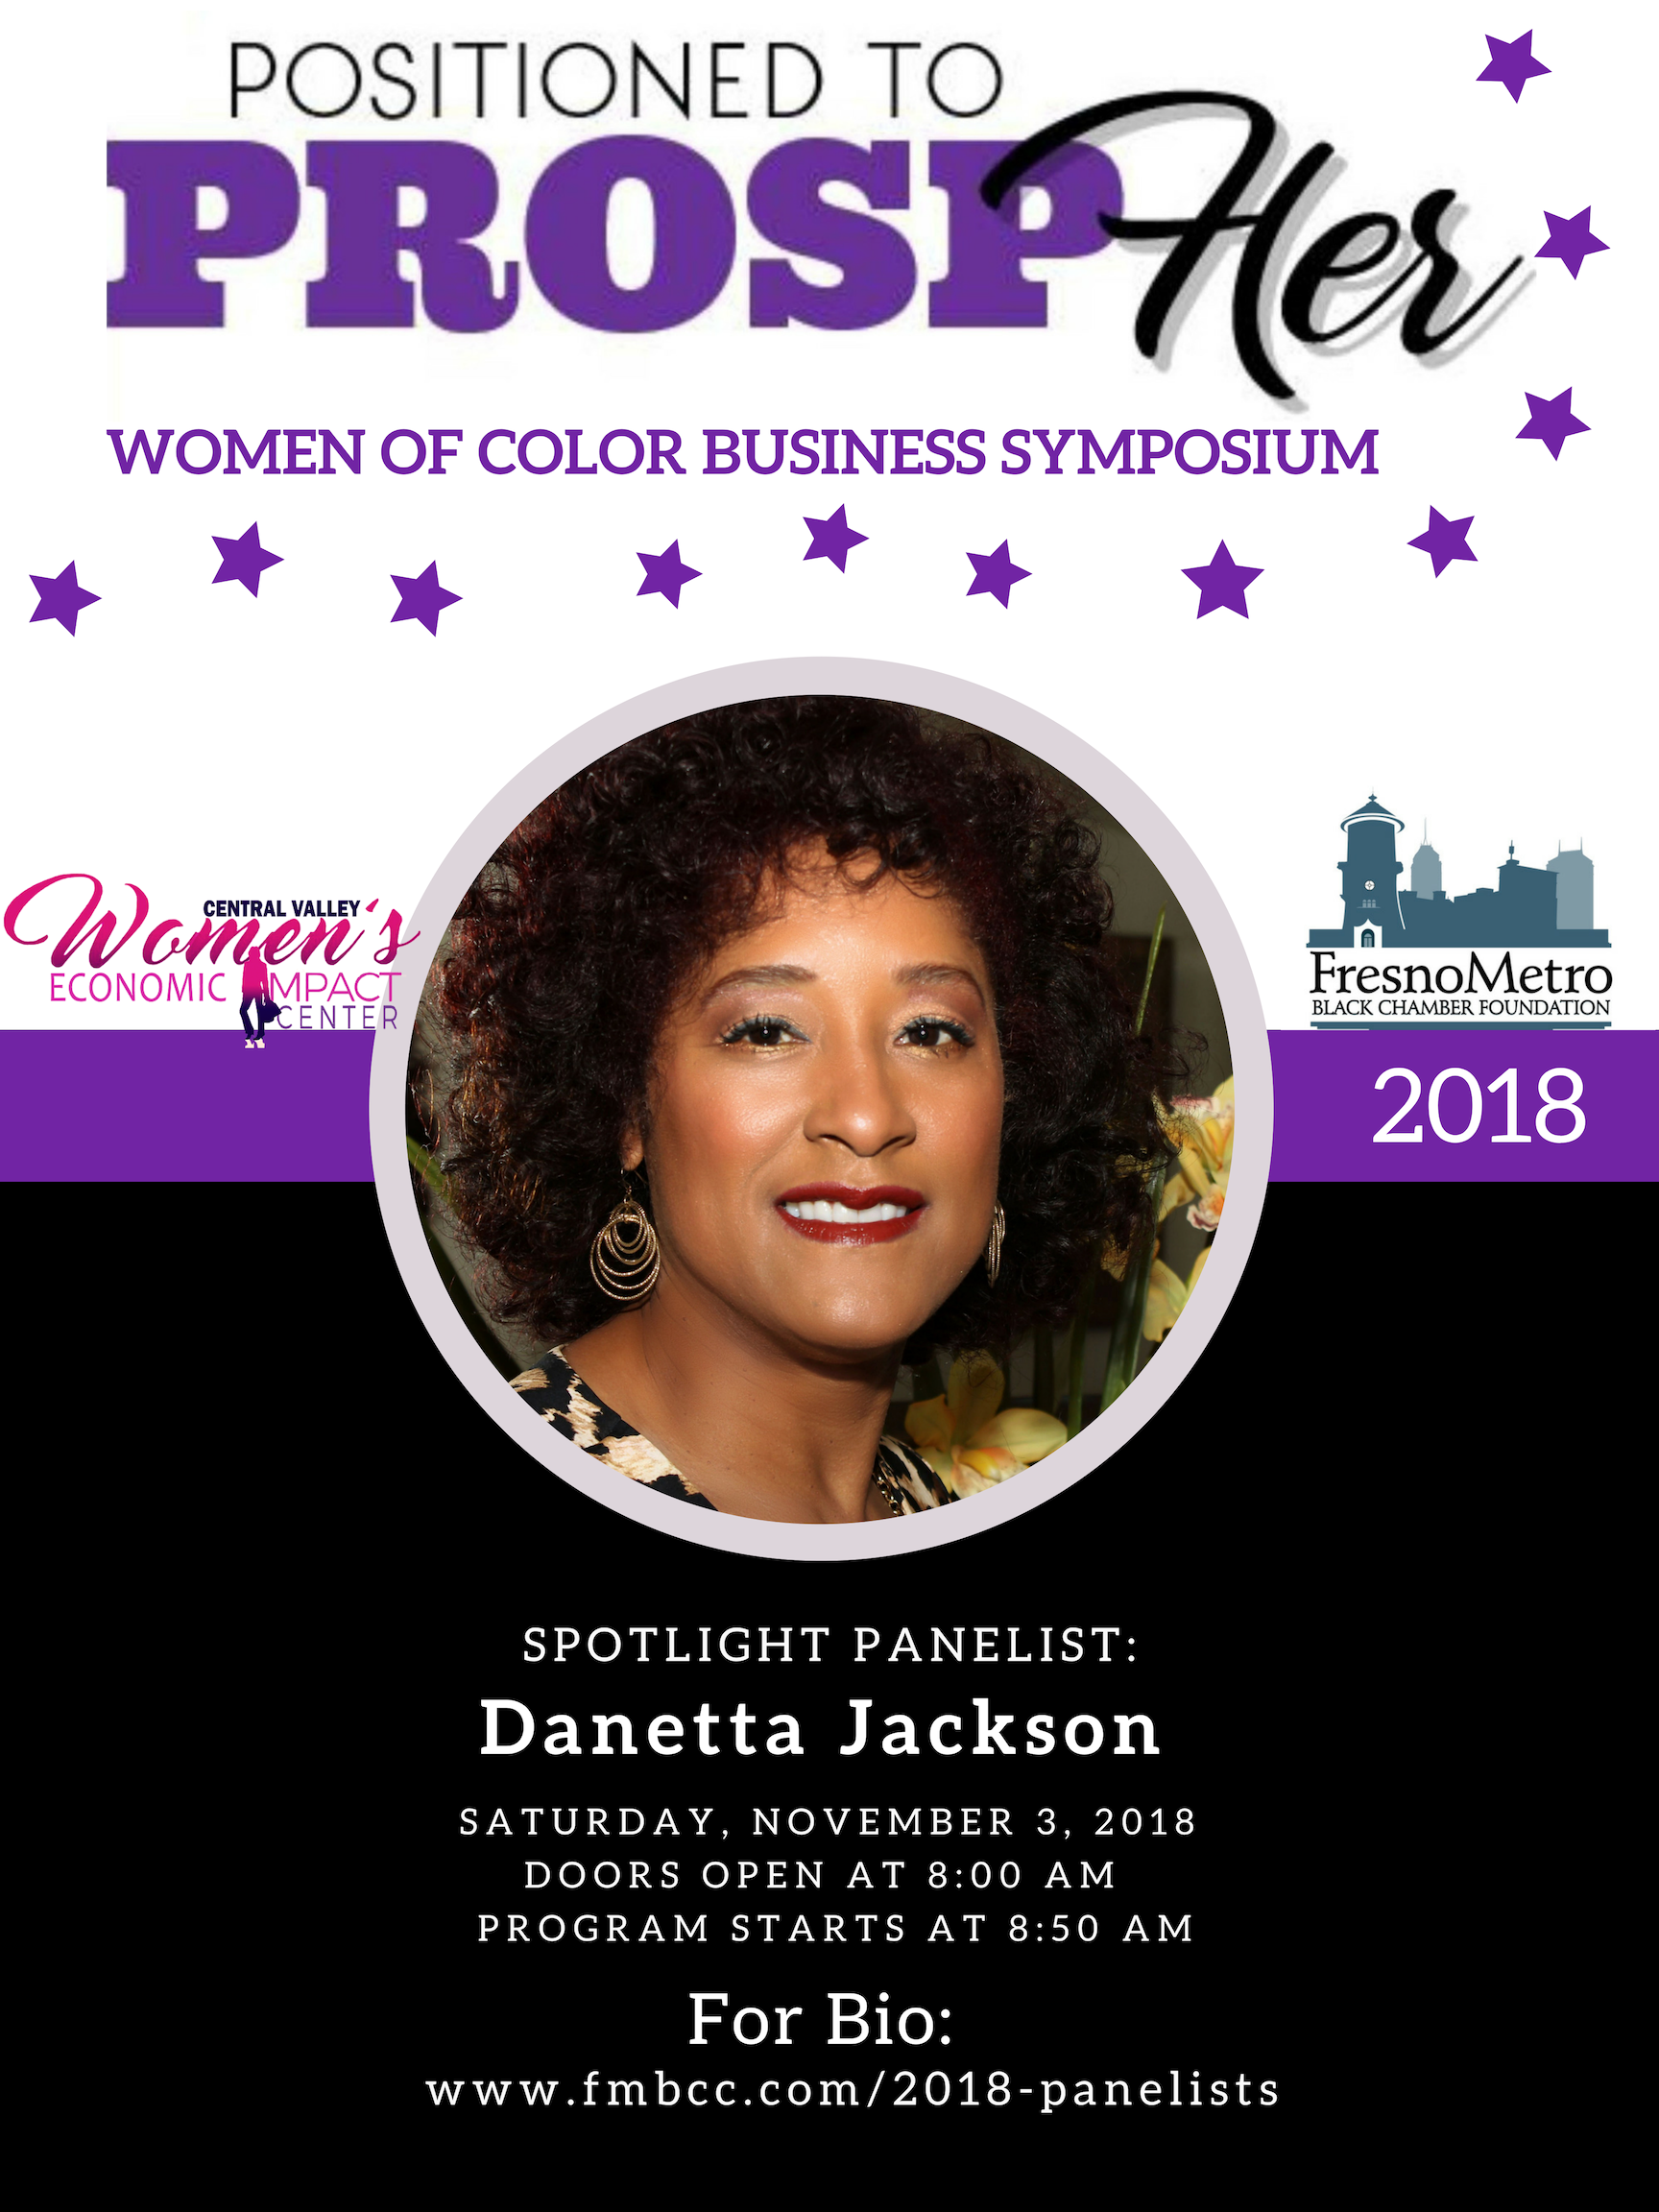 Danetta Jackson